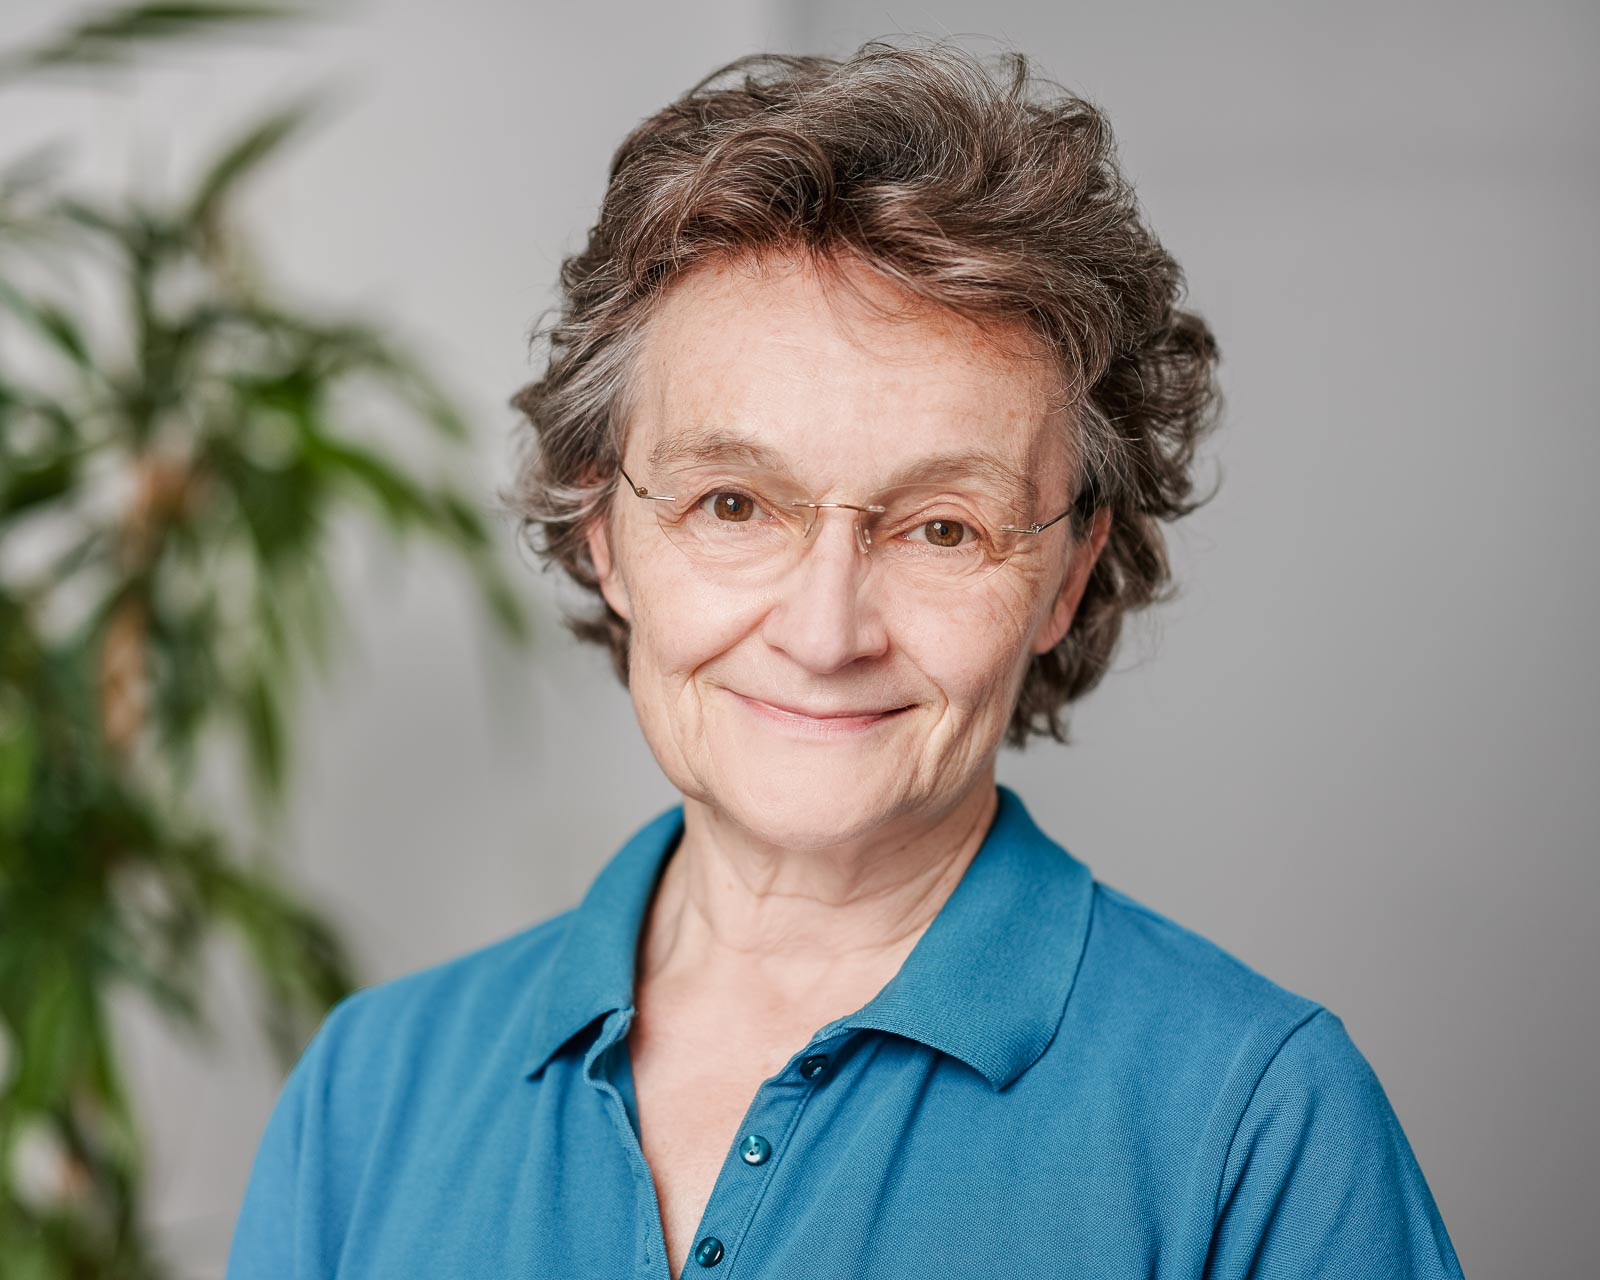 Prof. Dr. Martina Bacharach-Buhles